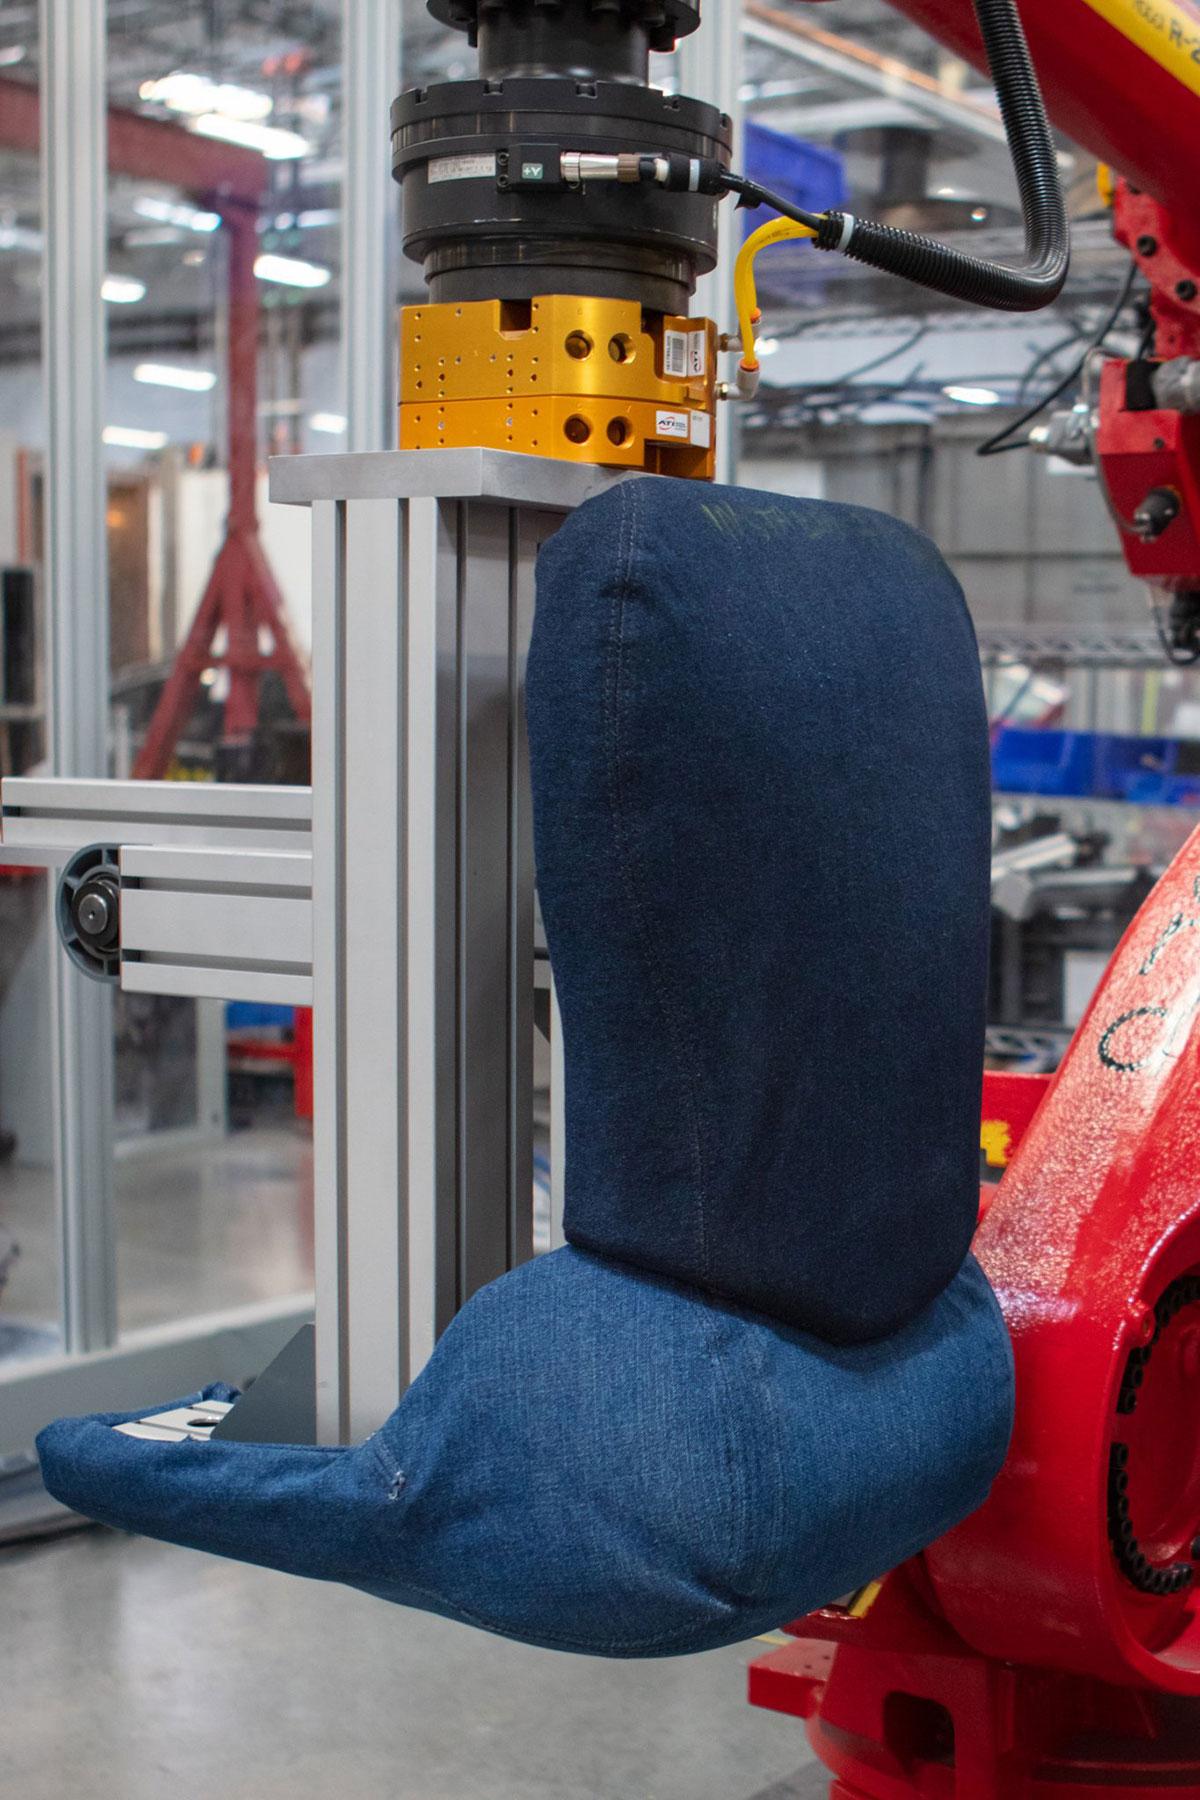 Tesla Model 3 seat tester model wearing blue jeans for stain resistance testing.